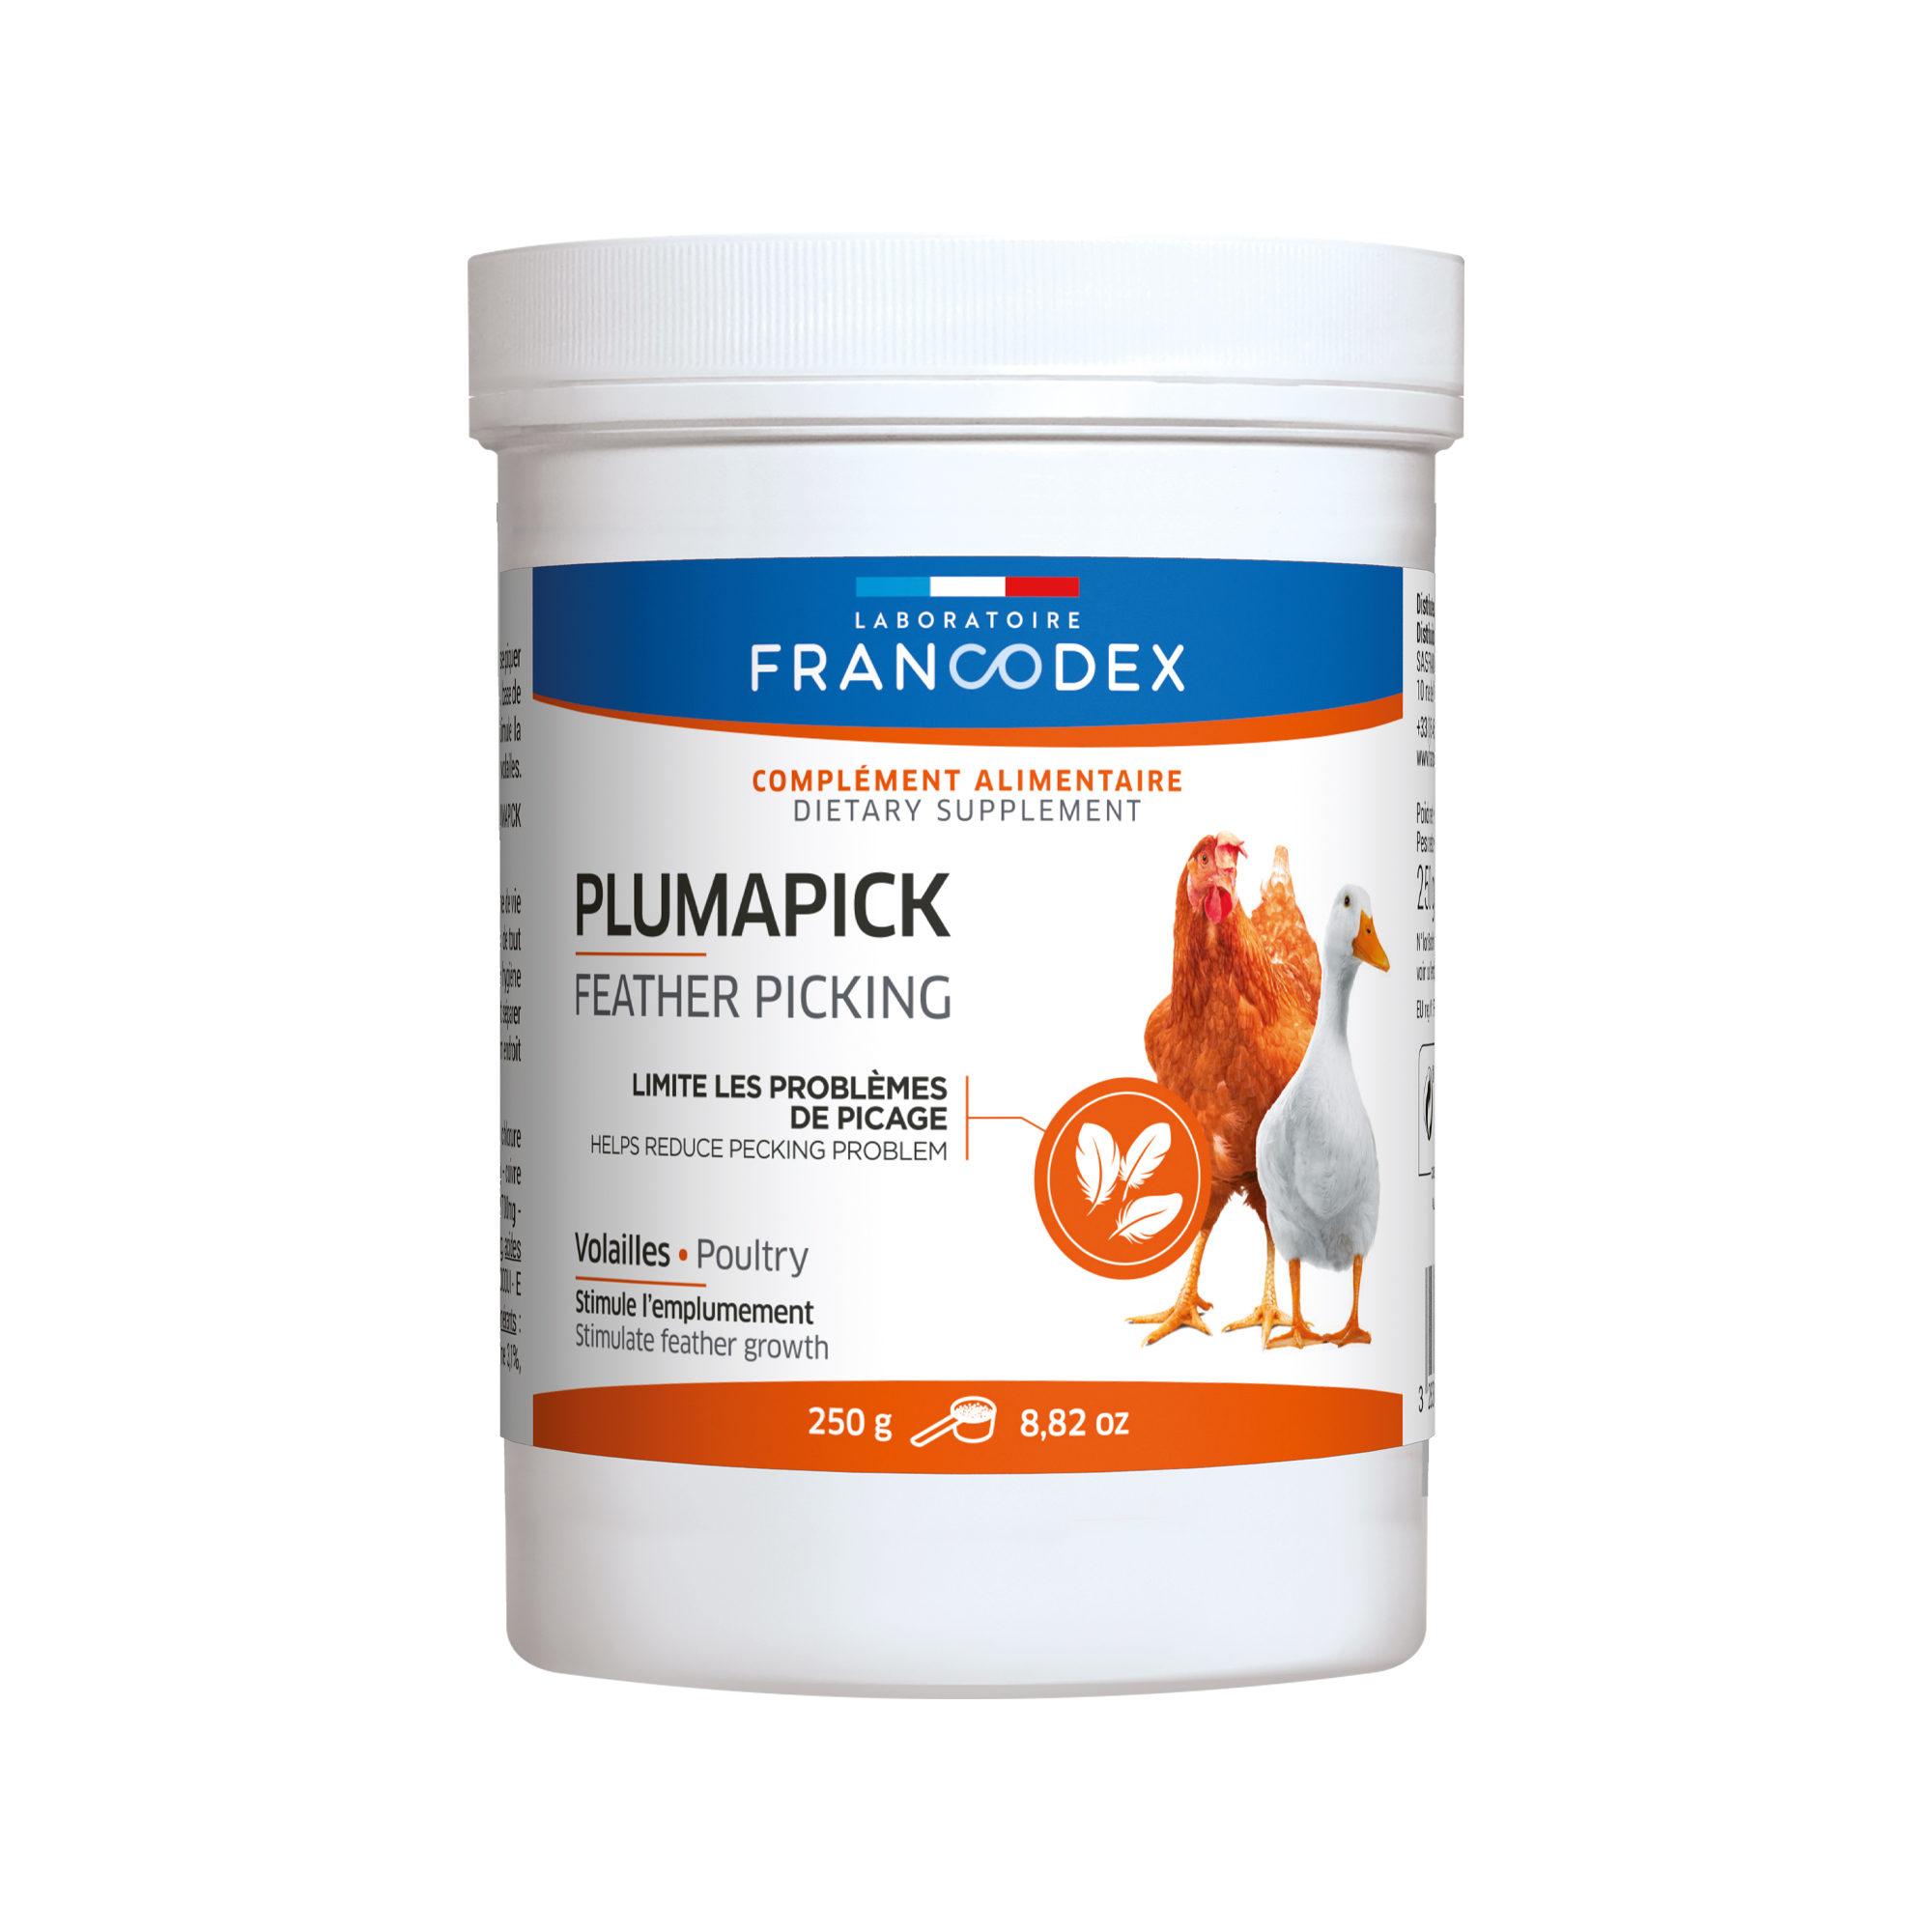 Francodex Plumapick für Geflügel